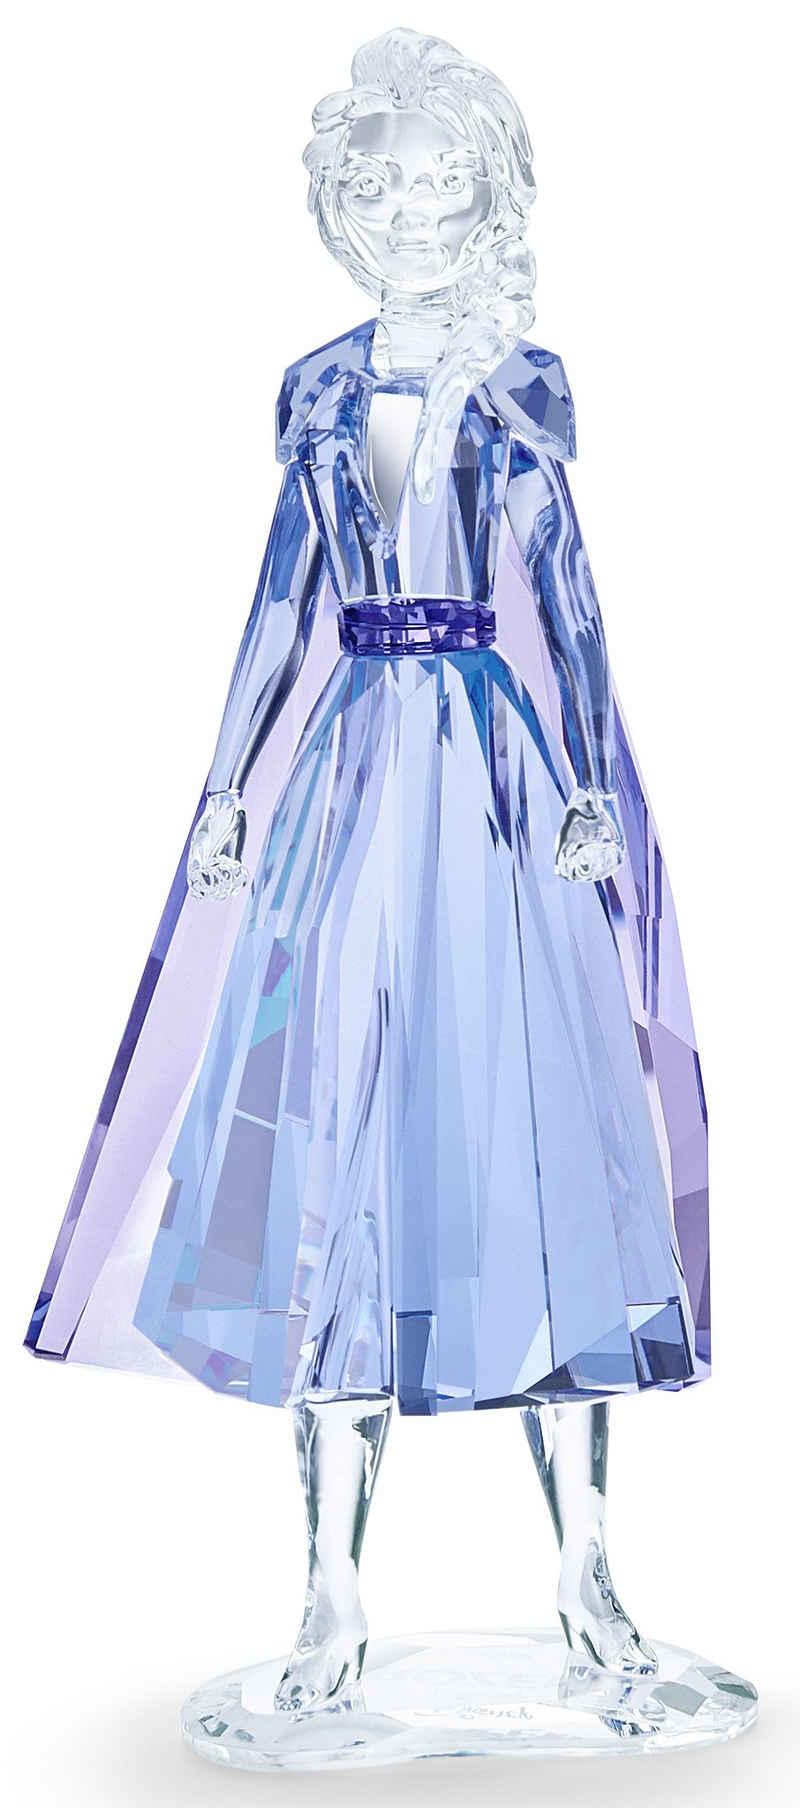 Swarovski Dekofigur »Die Eiskönigin 2 - Elsa, 5492735« (1 Stück), Swarovski® Kristall